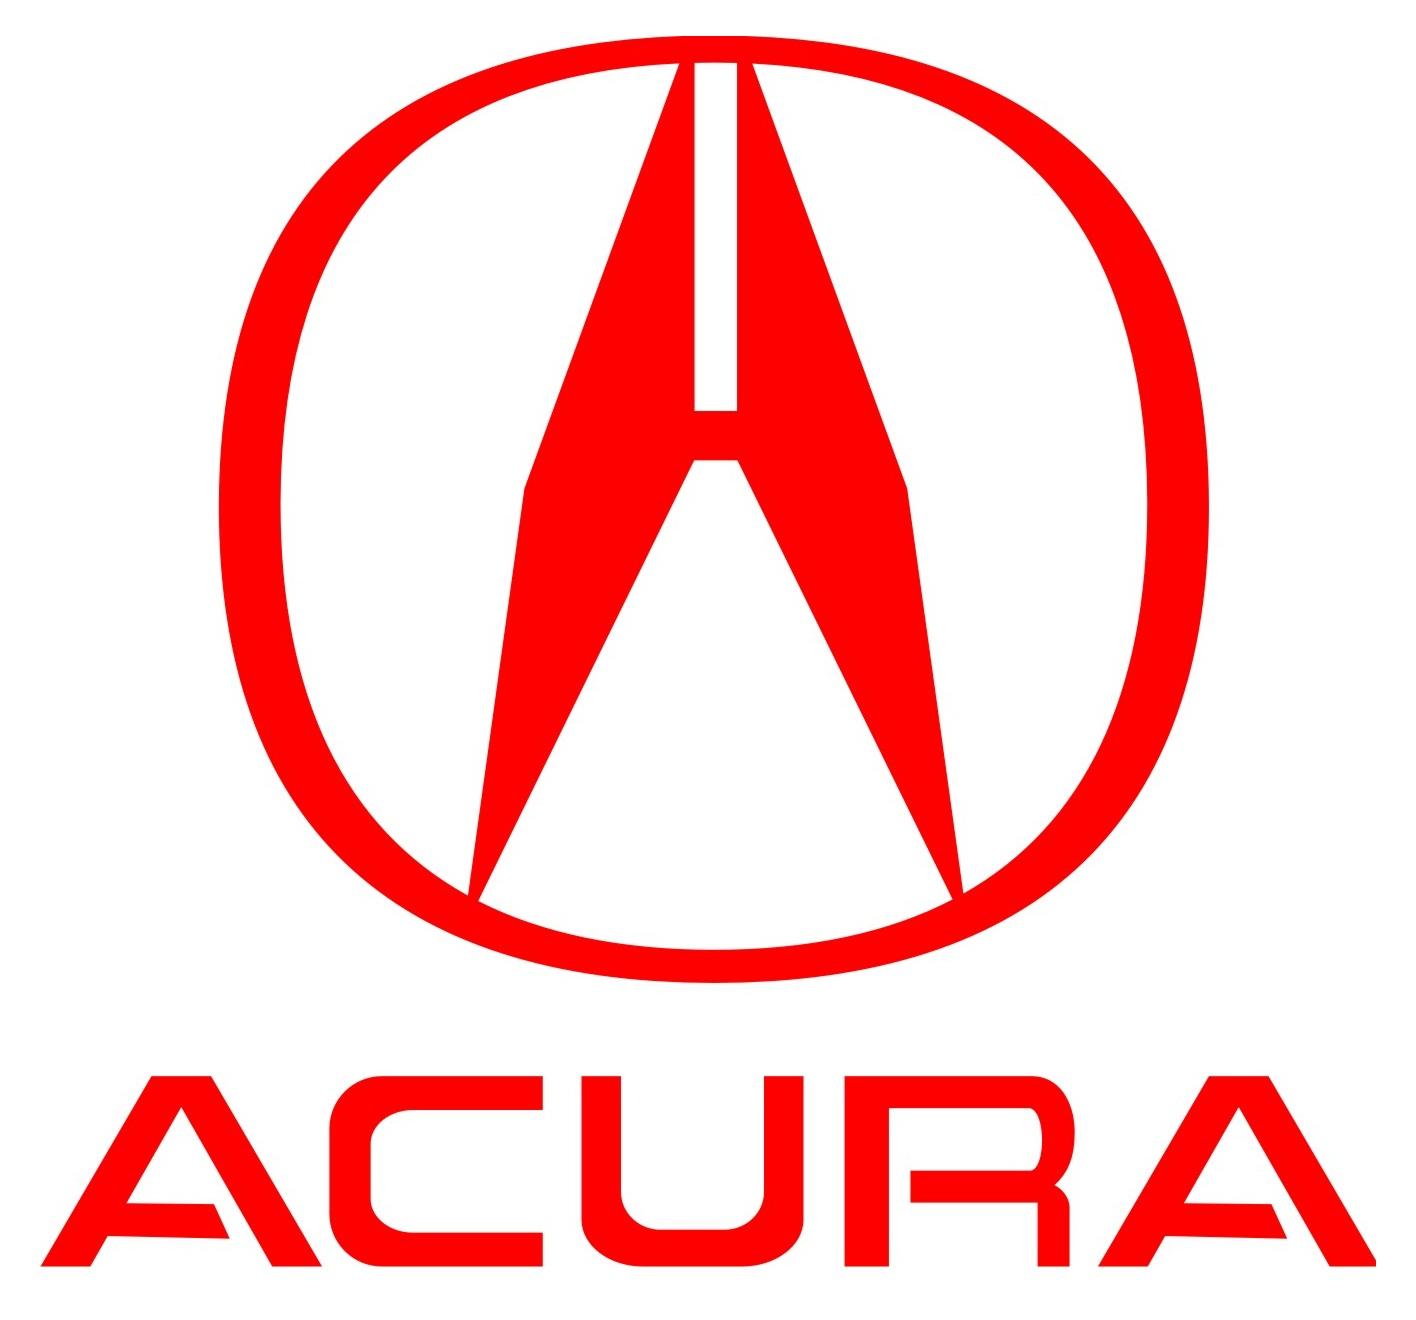 http://4.bp.blogspot.com/-UiO6YNXiyxc/USZLabi83PI/AAAAAAAABeo/dDOLH5PoFm0/s1600/acura-logo-wallpaper.jpg